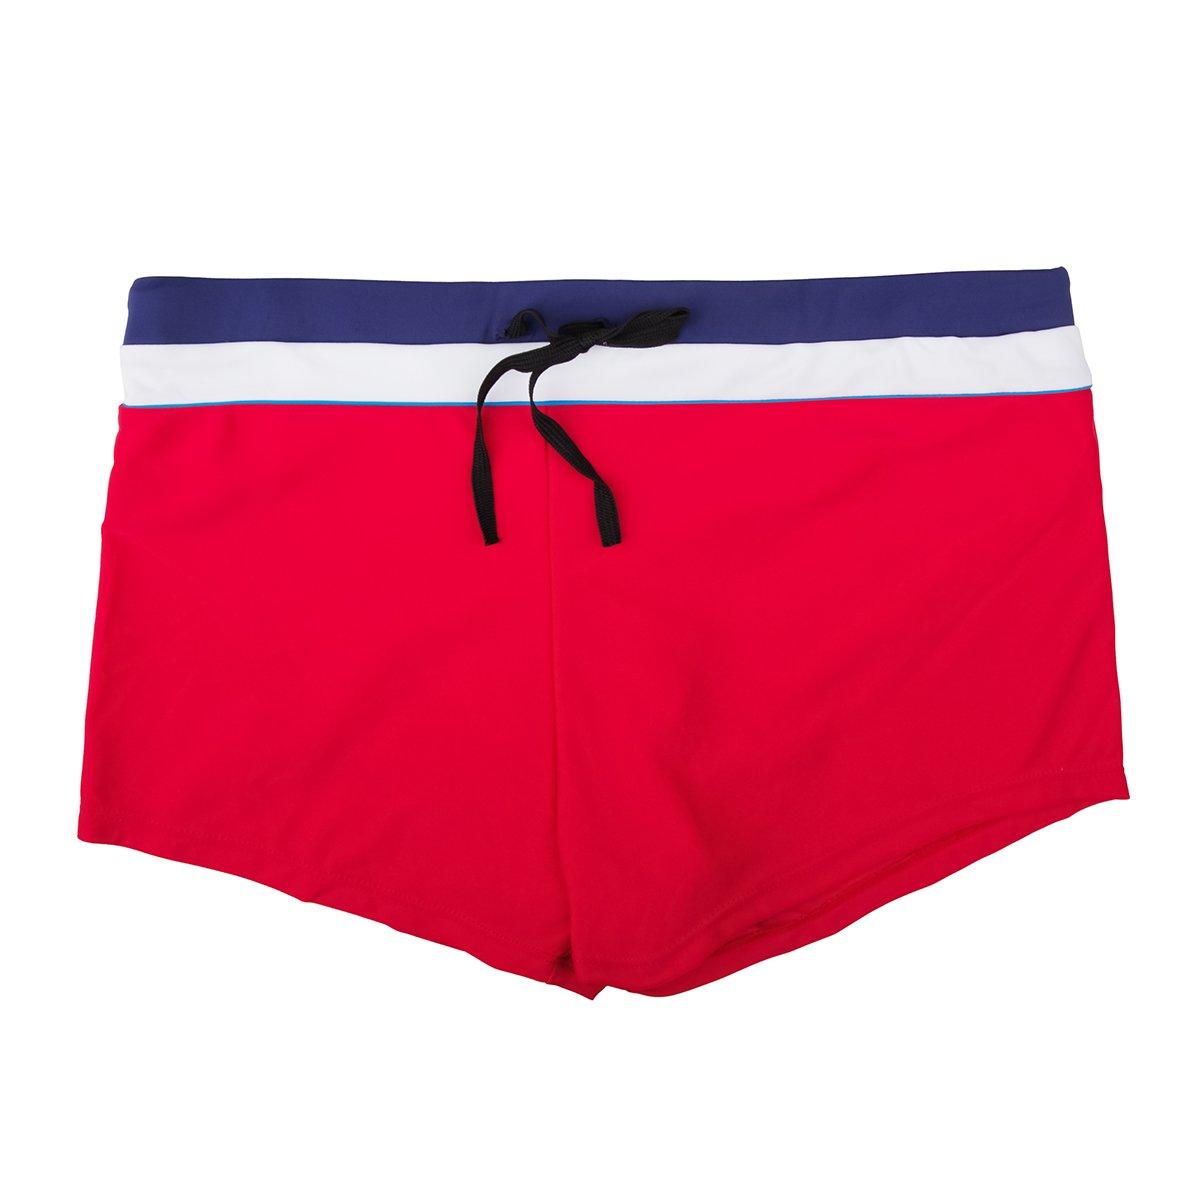 Elemar Herren Shorts Short Badeshorts Badehose Freizeitshorts marineblau XXL-5x